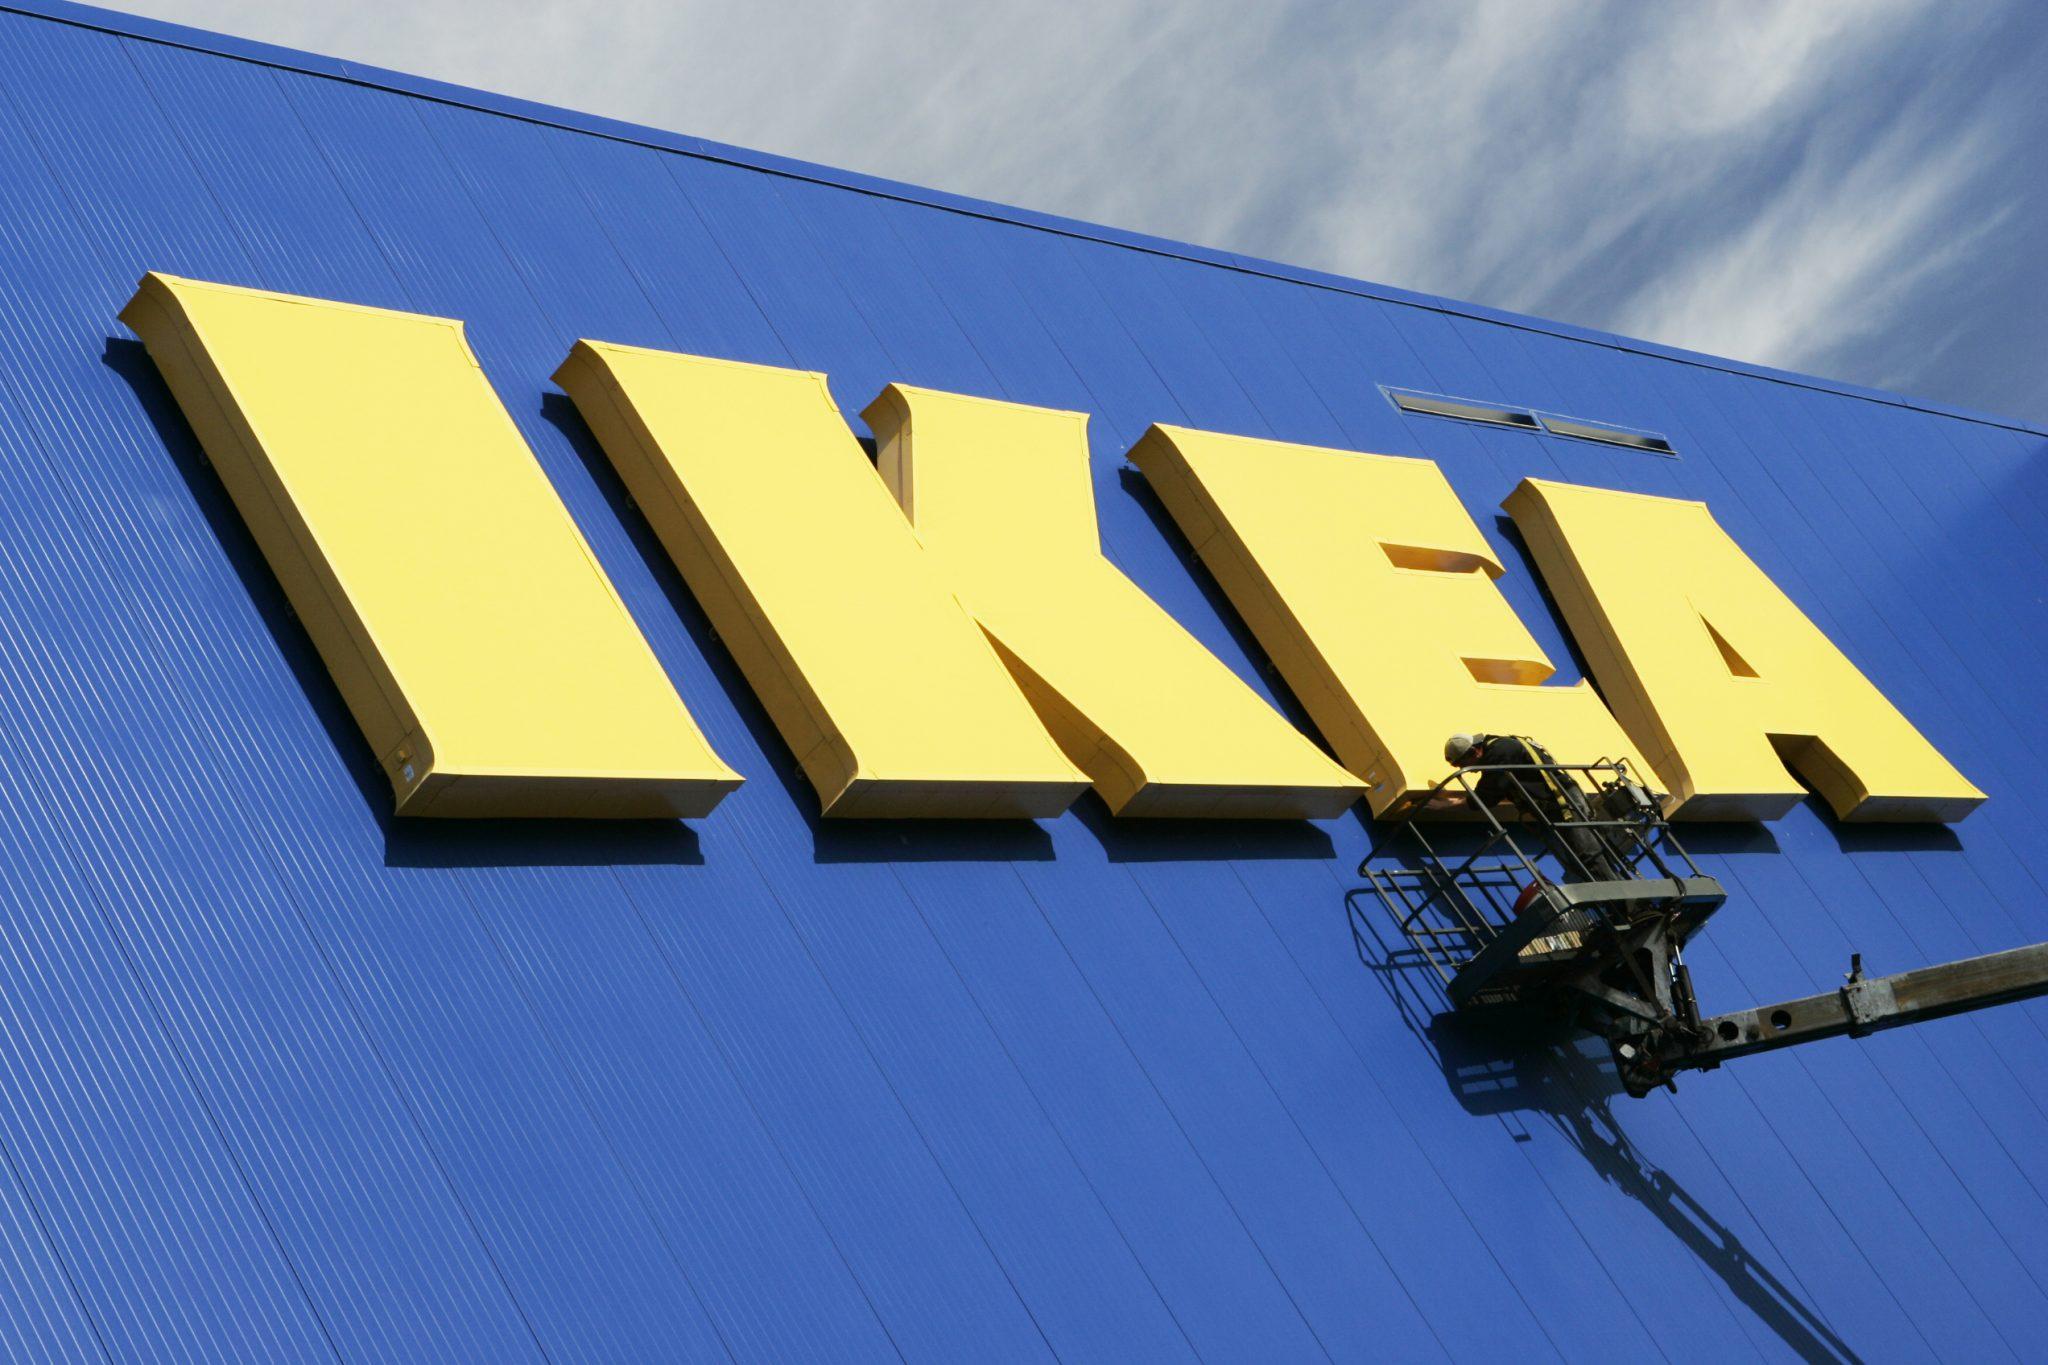 Ikea to invest €4 billion in renewable energy